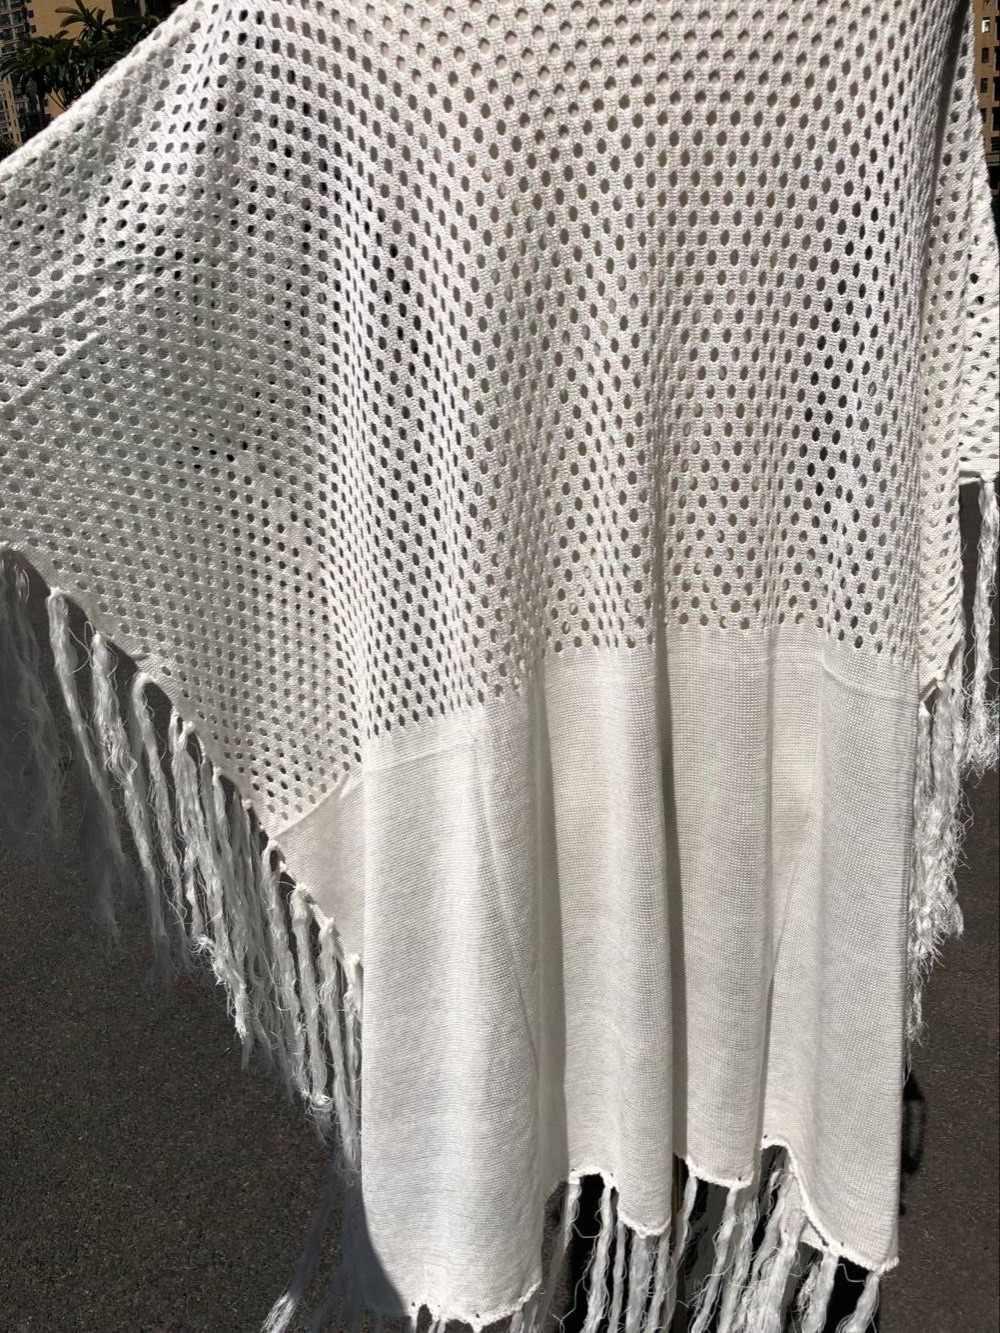 d2cb33158aa ... 2019 Fringed Summer Women Beach Wear Swim Suit Cover Up Bath Dress Sexy  White Crochet Tunic ...